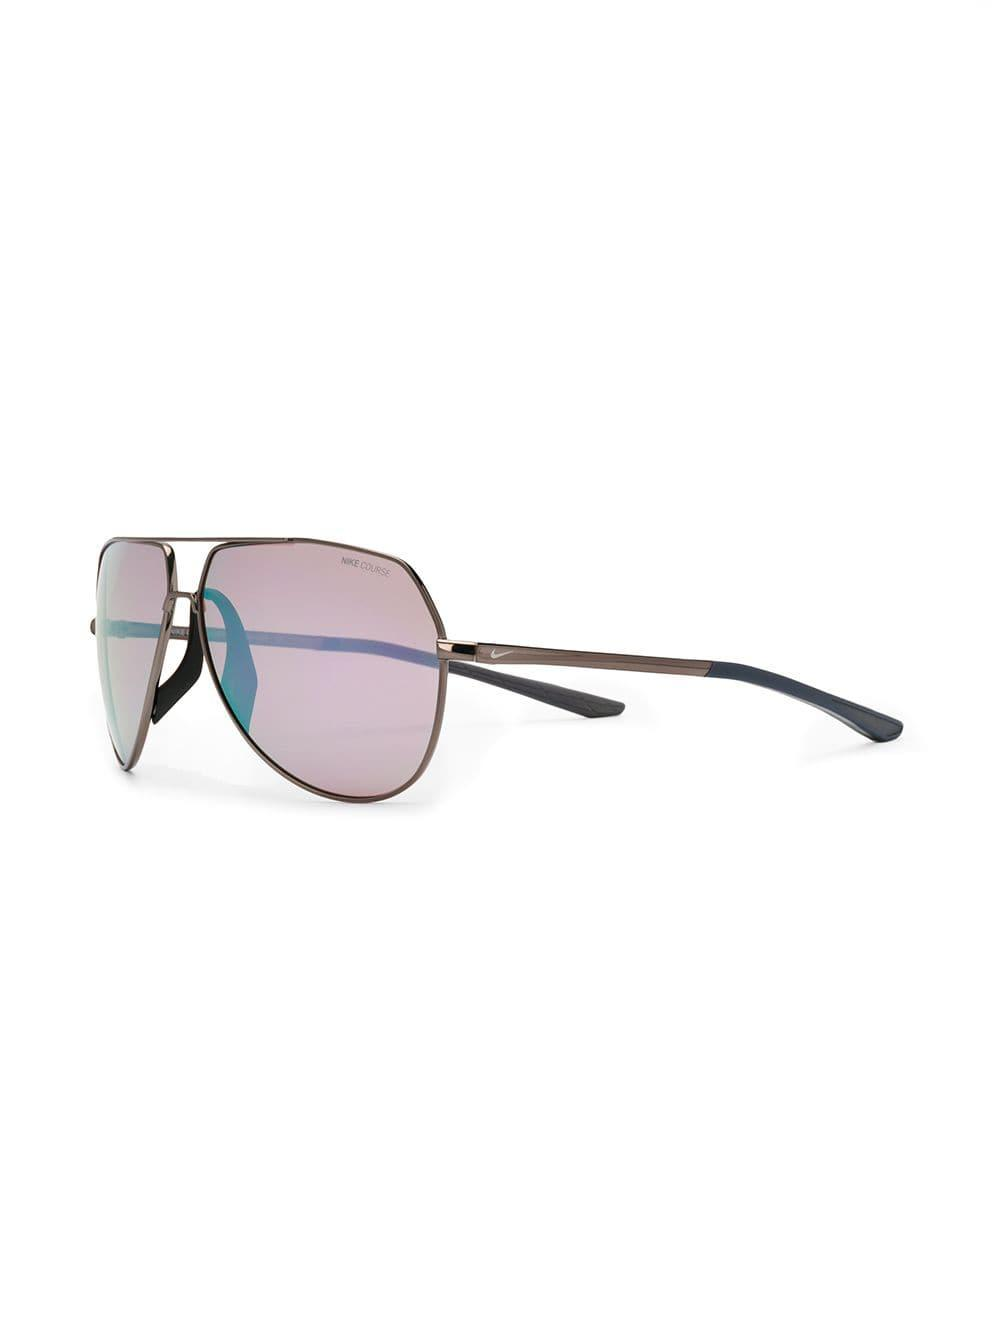 87825228e74 Nike - Gray Outrider Sunglasses - Lyst. View fullscreen